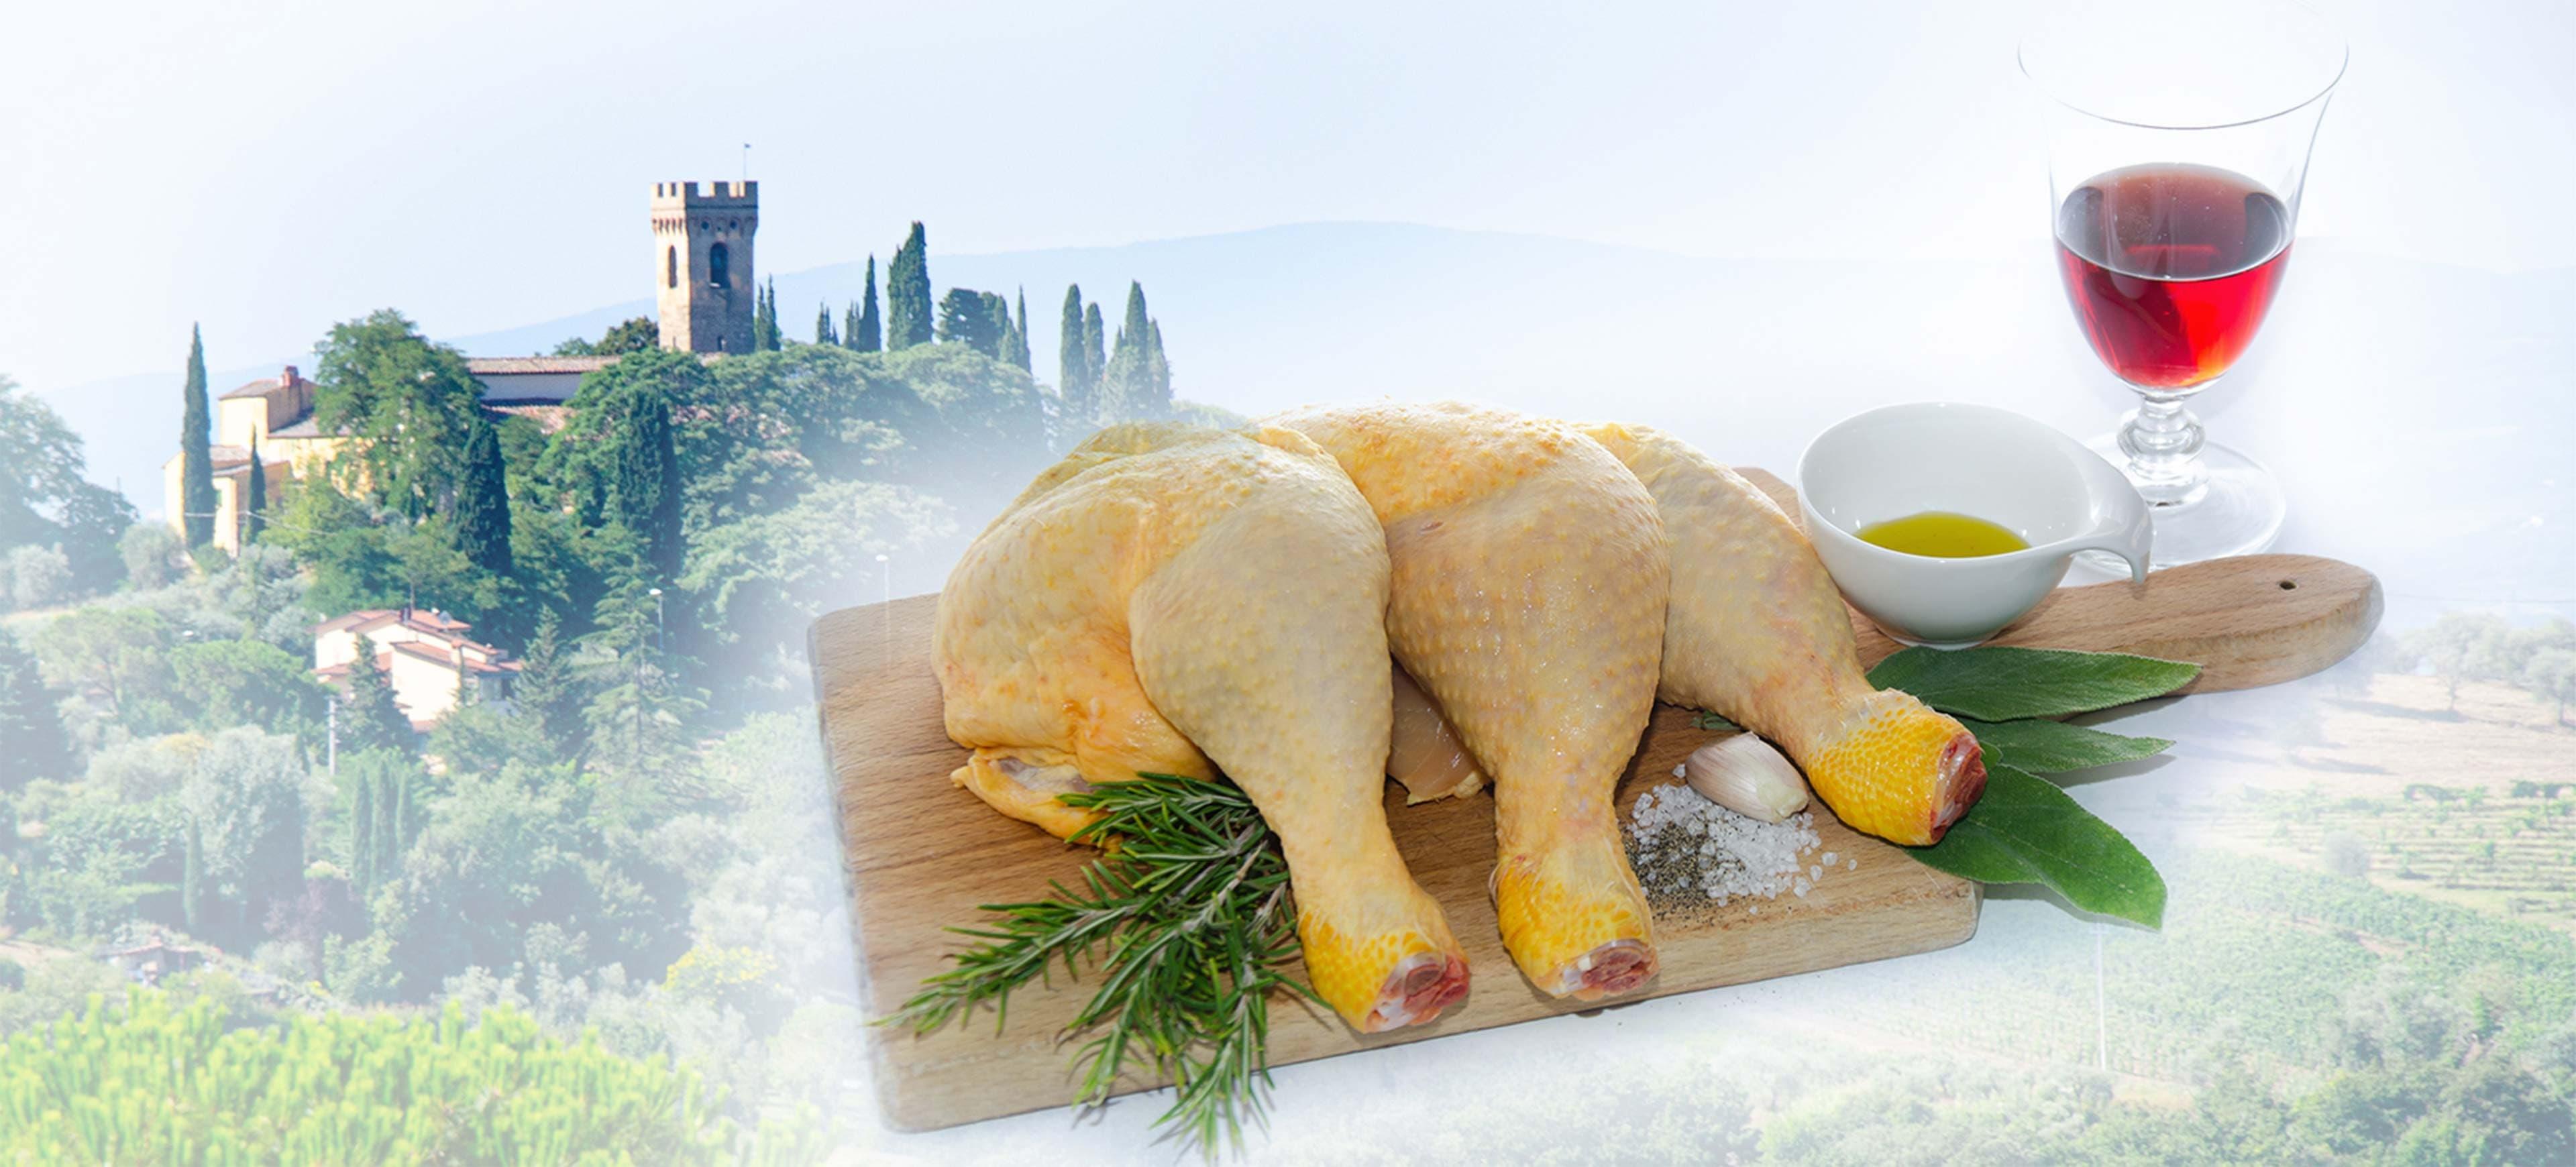 Prodotti carni bianche in Toscana Cinelli srl